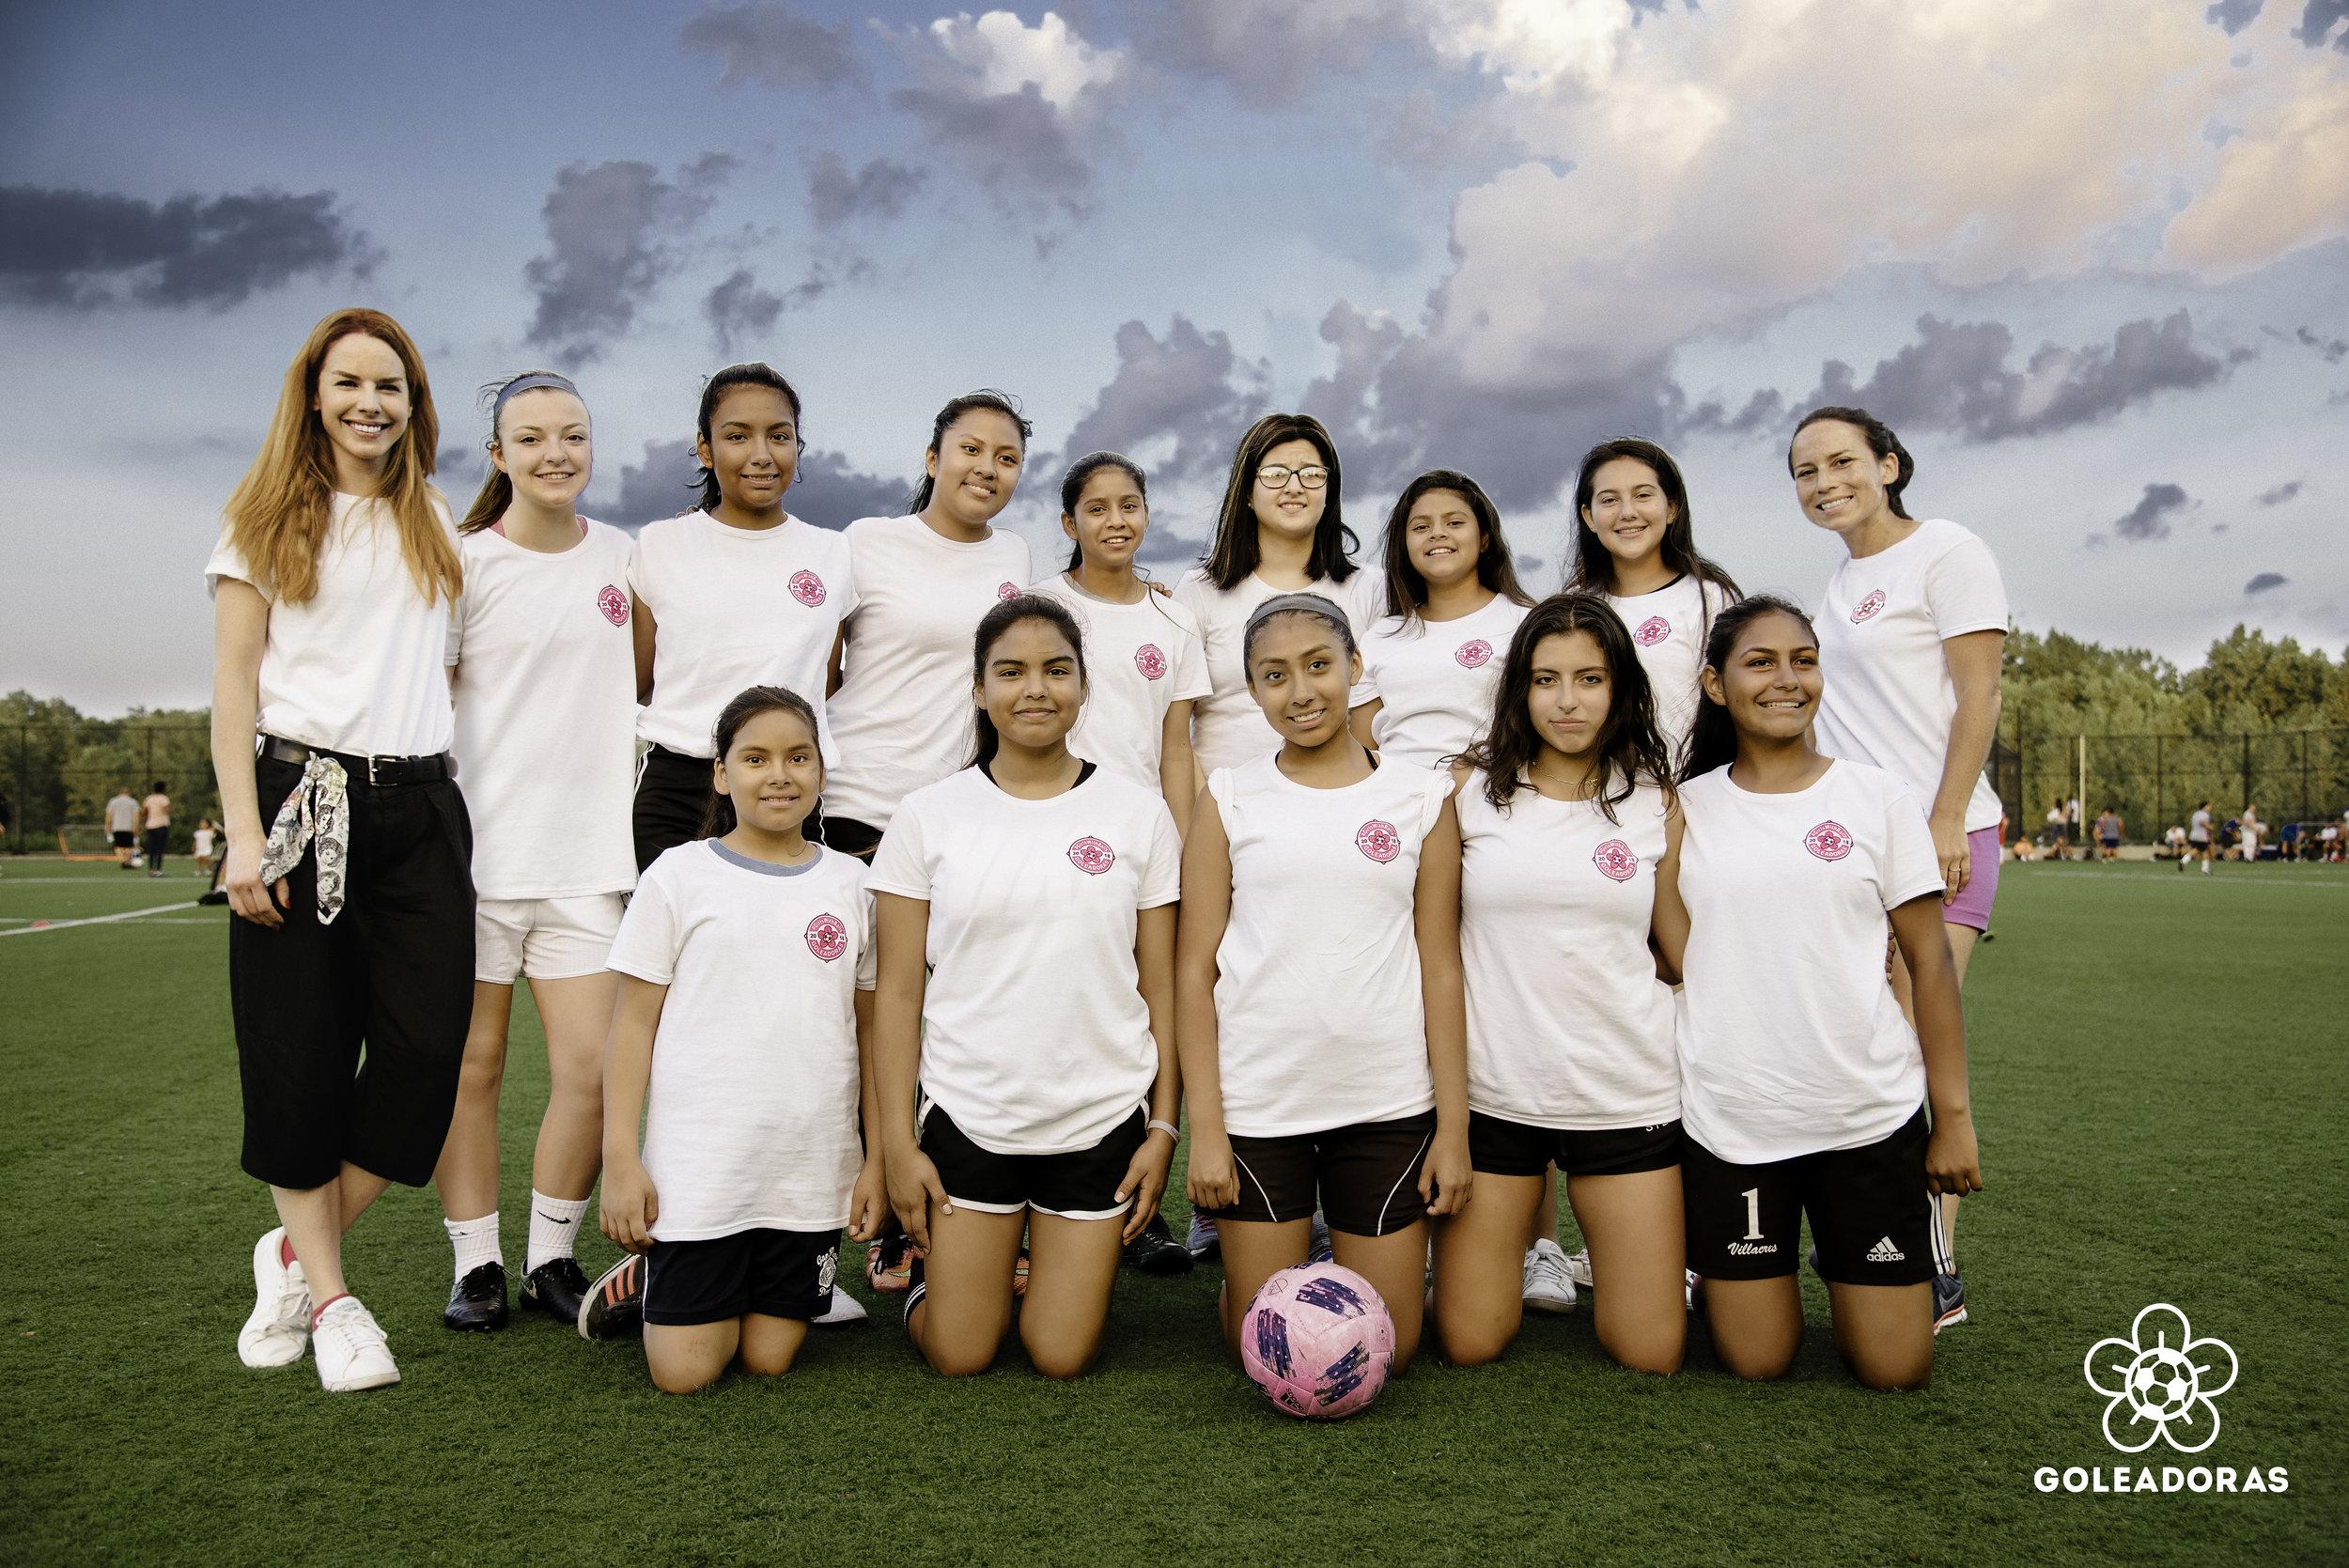 GOLEADORAS - #GIRLSWITHBALLS